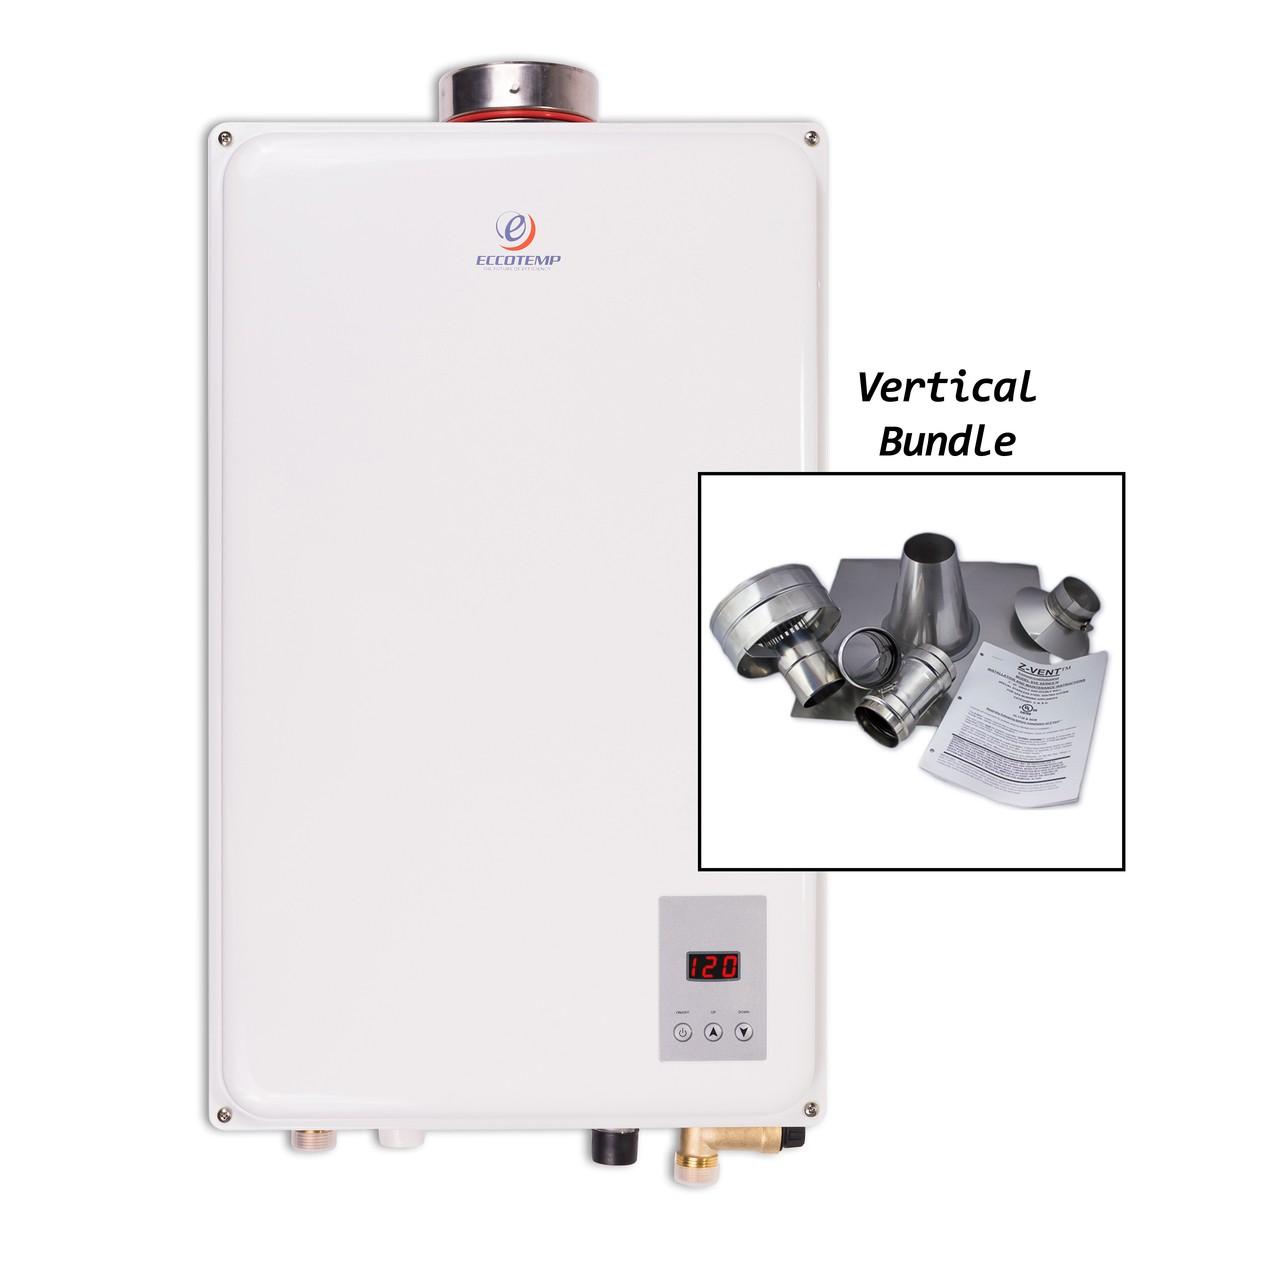 Eccotemp 45HI NG Vertical Vent Bundle Tankless water heater